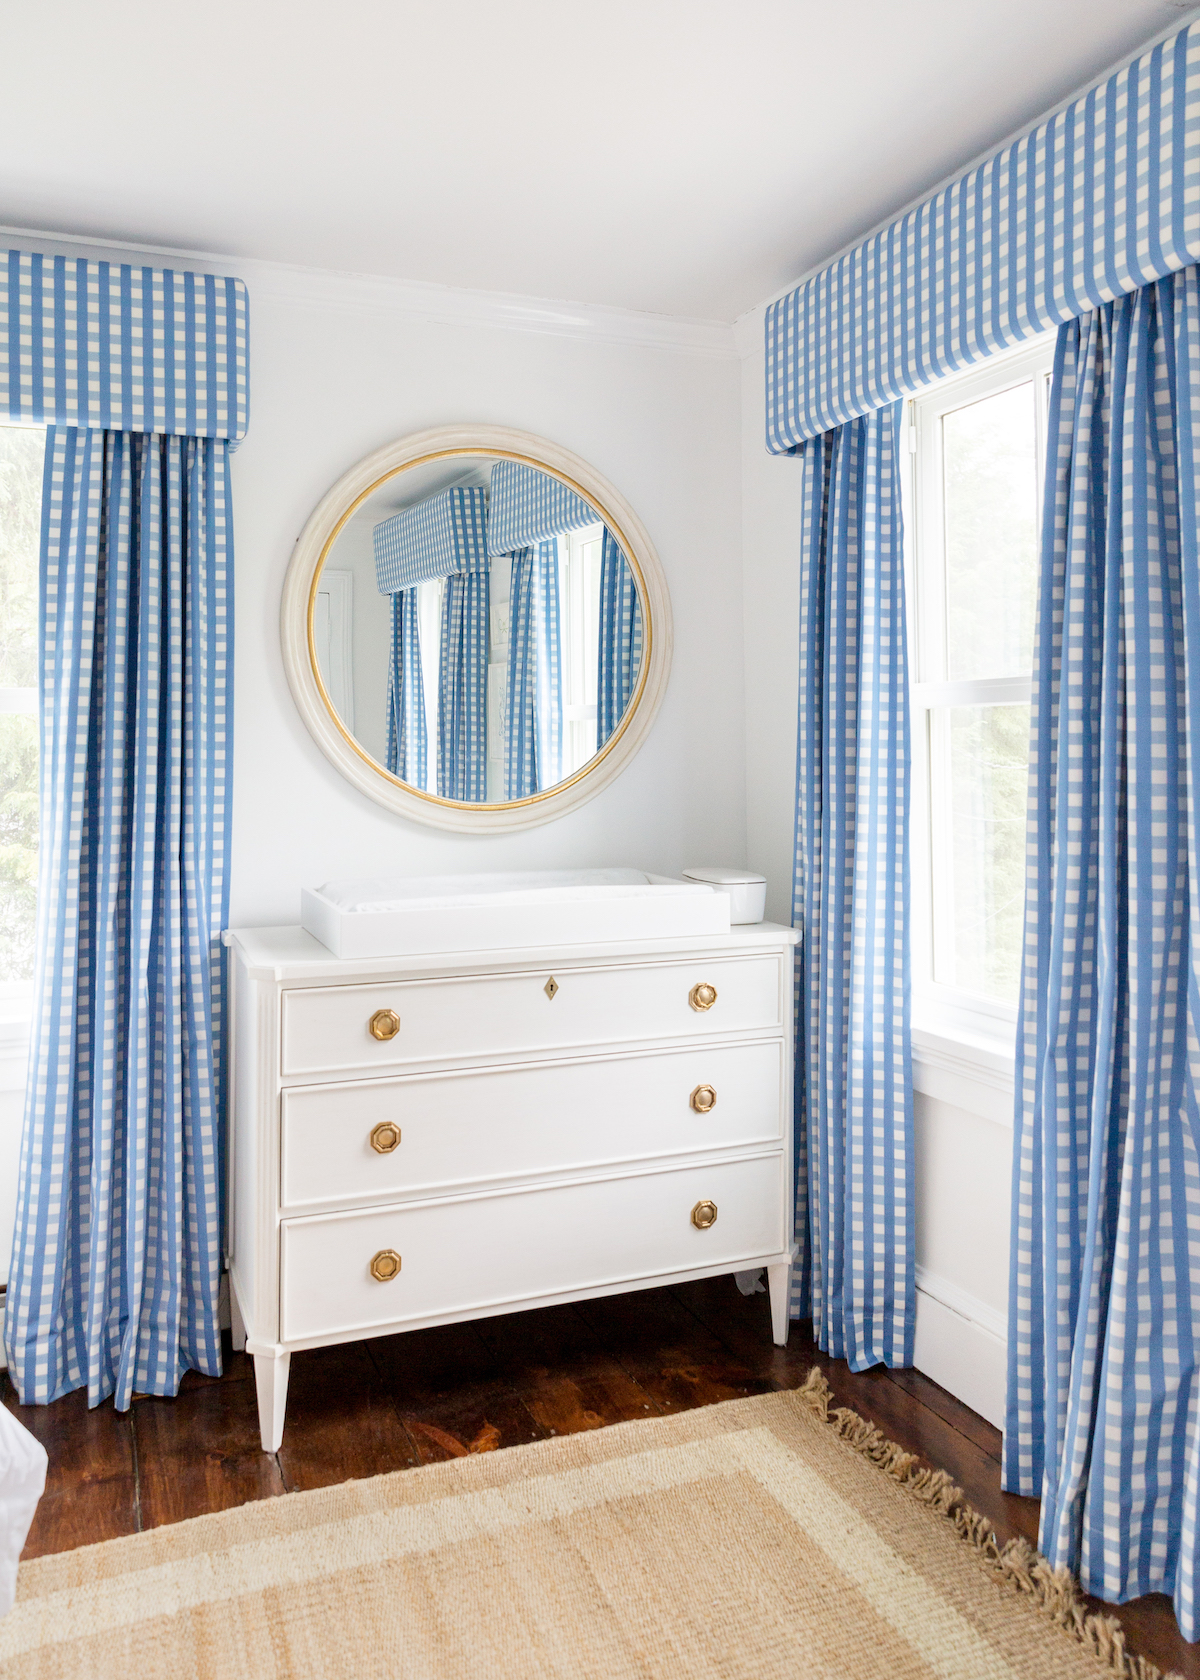 schumacher bermuda check cornflower fabric curtains and caitlin wilson helena dresser